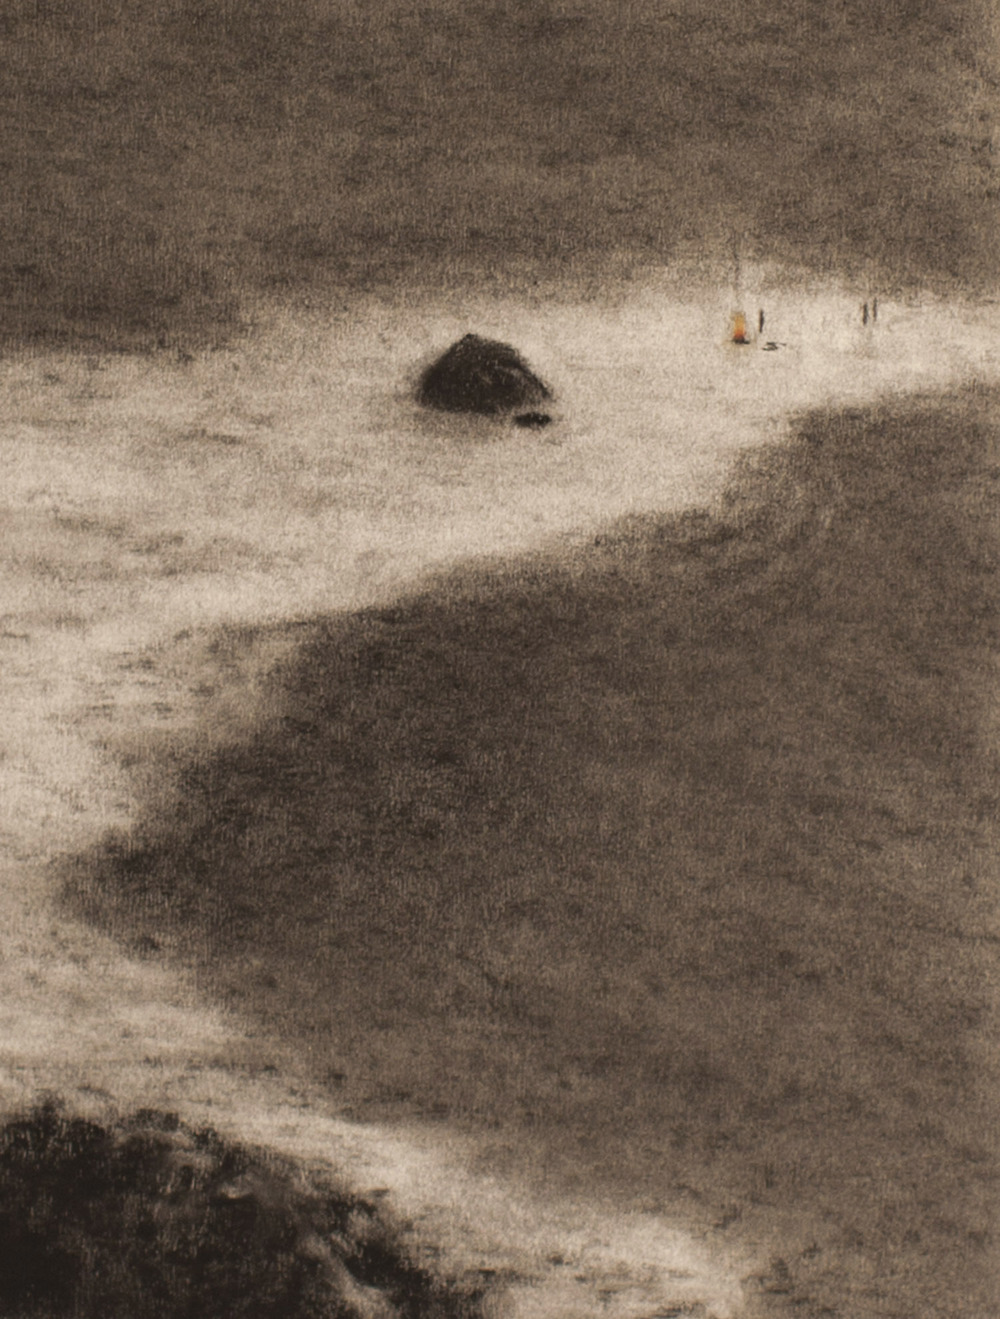 72-hunting-fire-detail.jpg